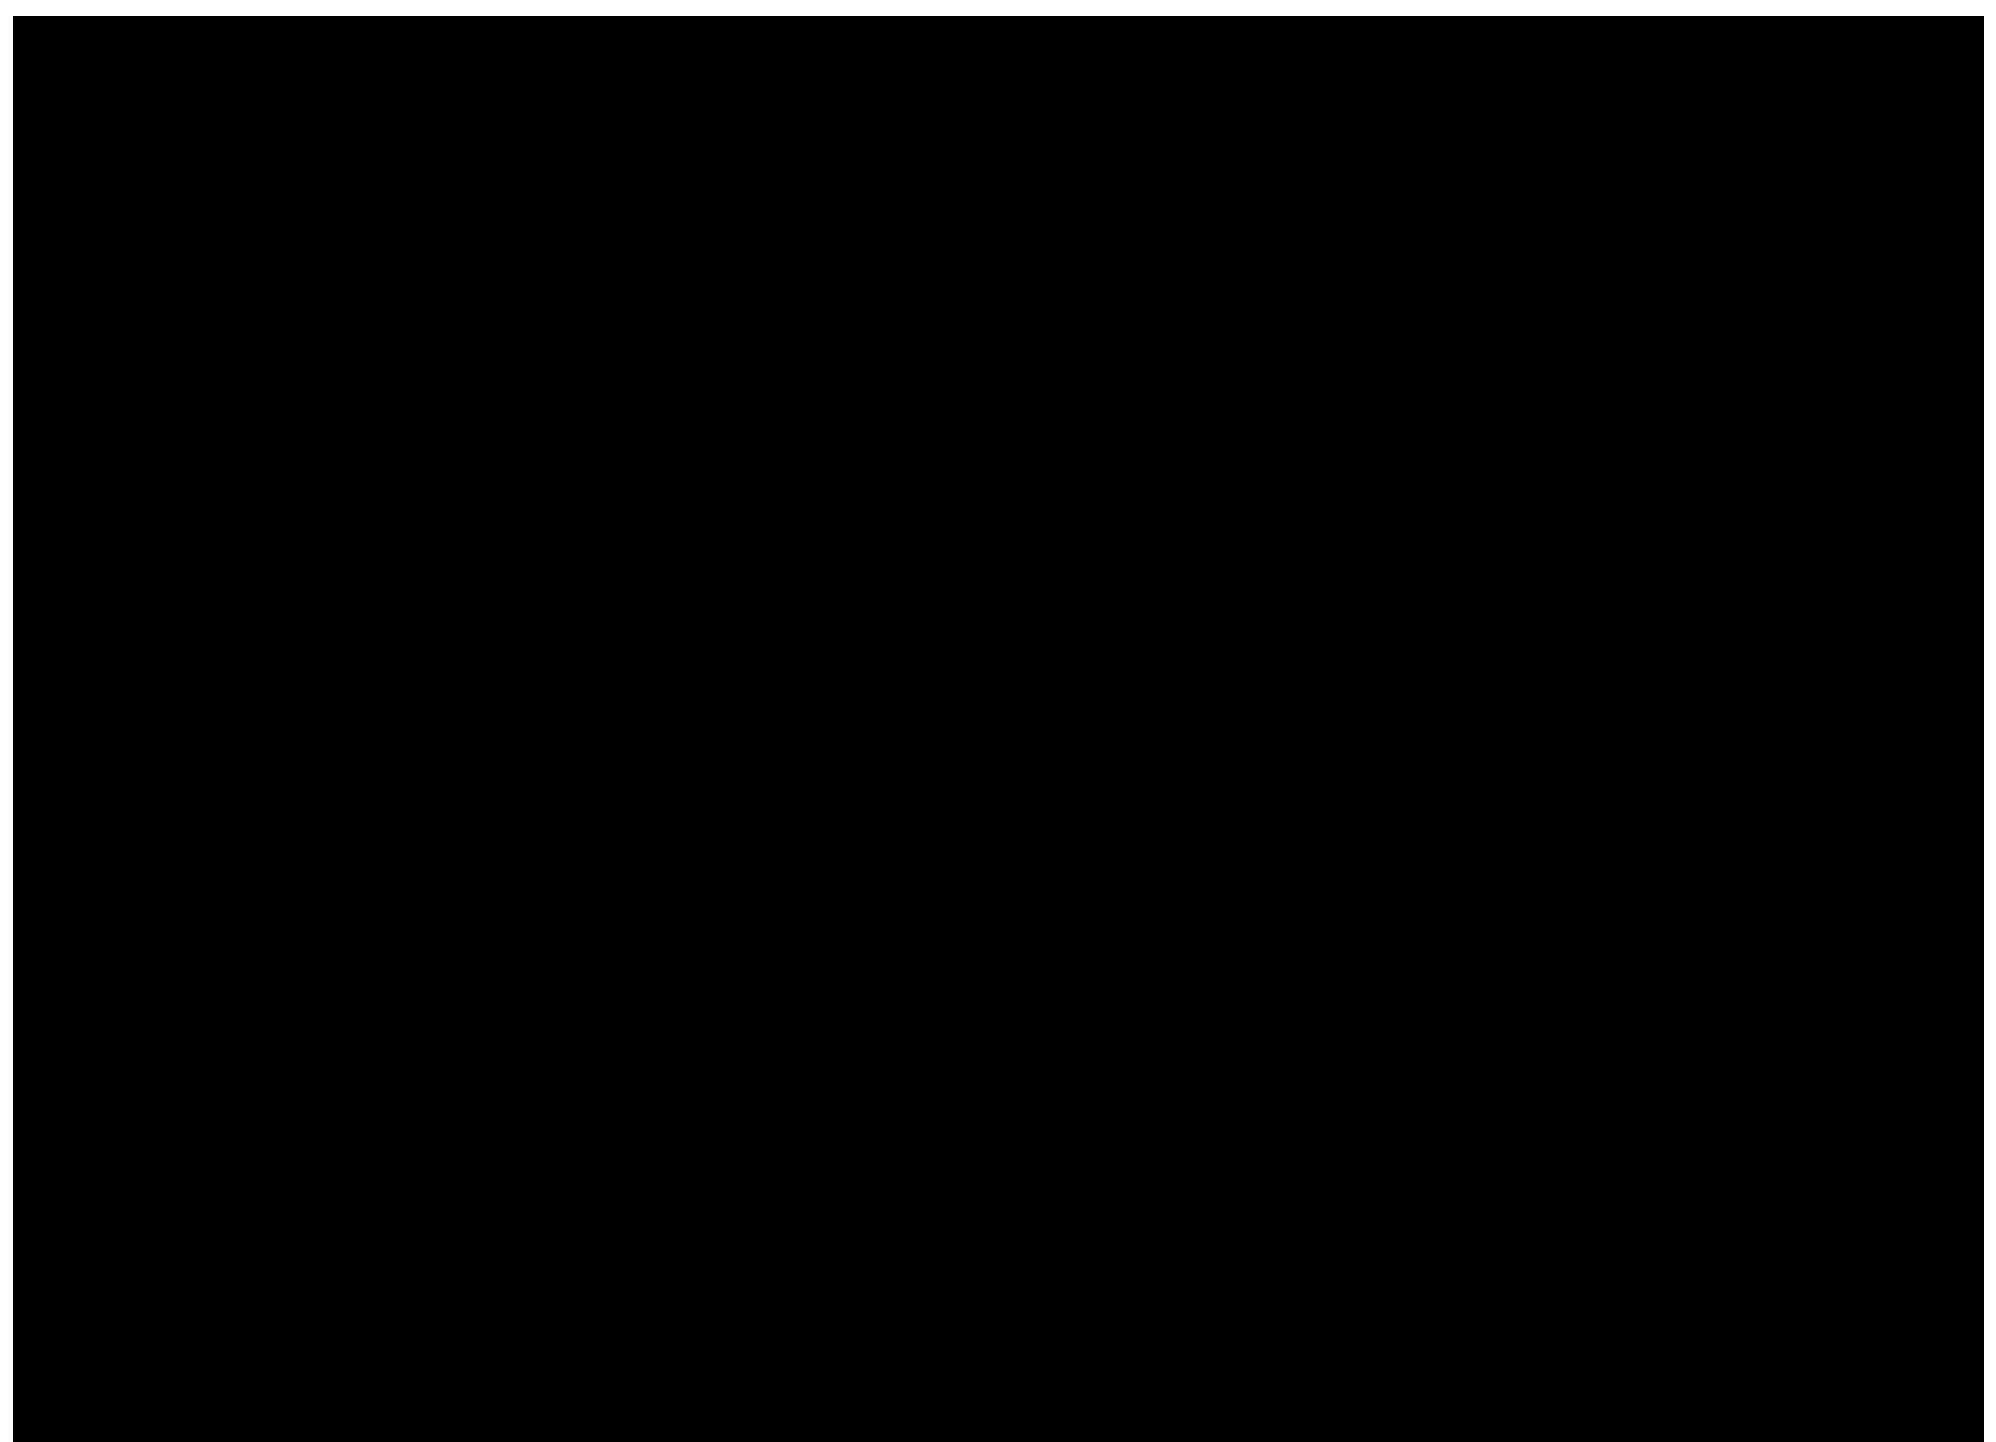 icons-broken-same-width.png